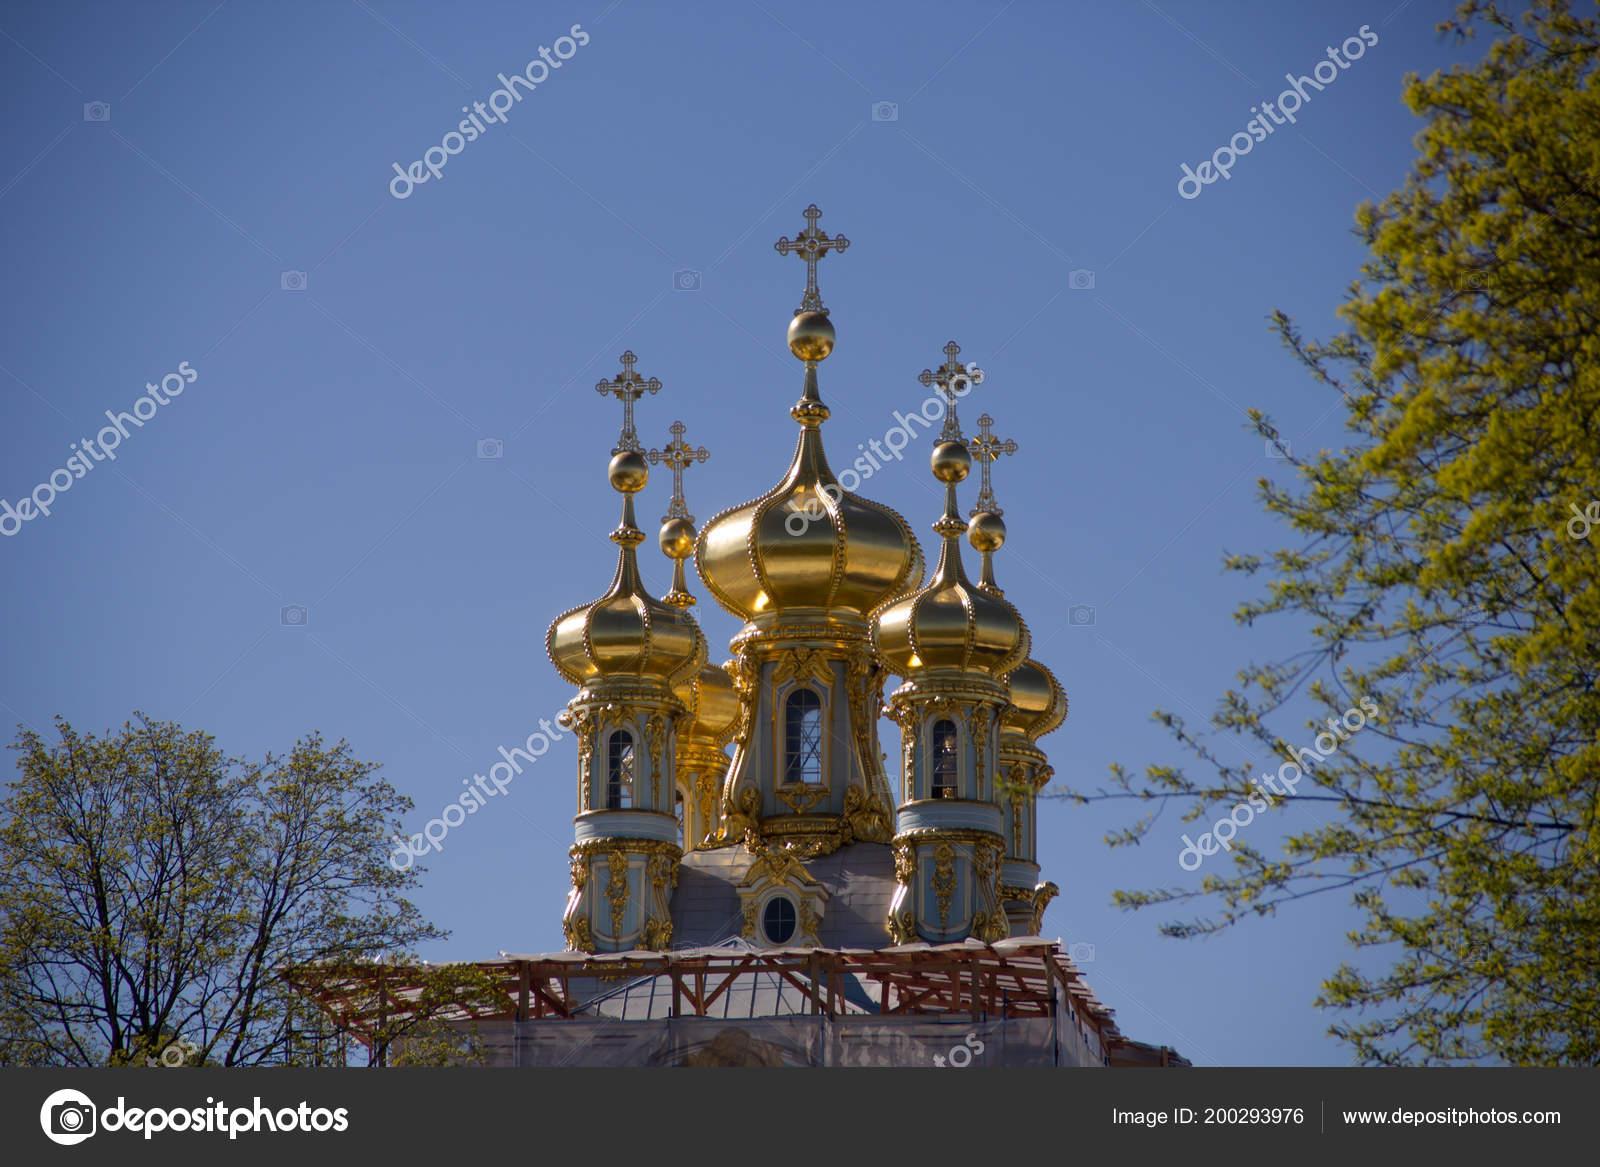 Temples of St. Petersburg and Leningrad region